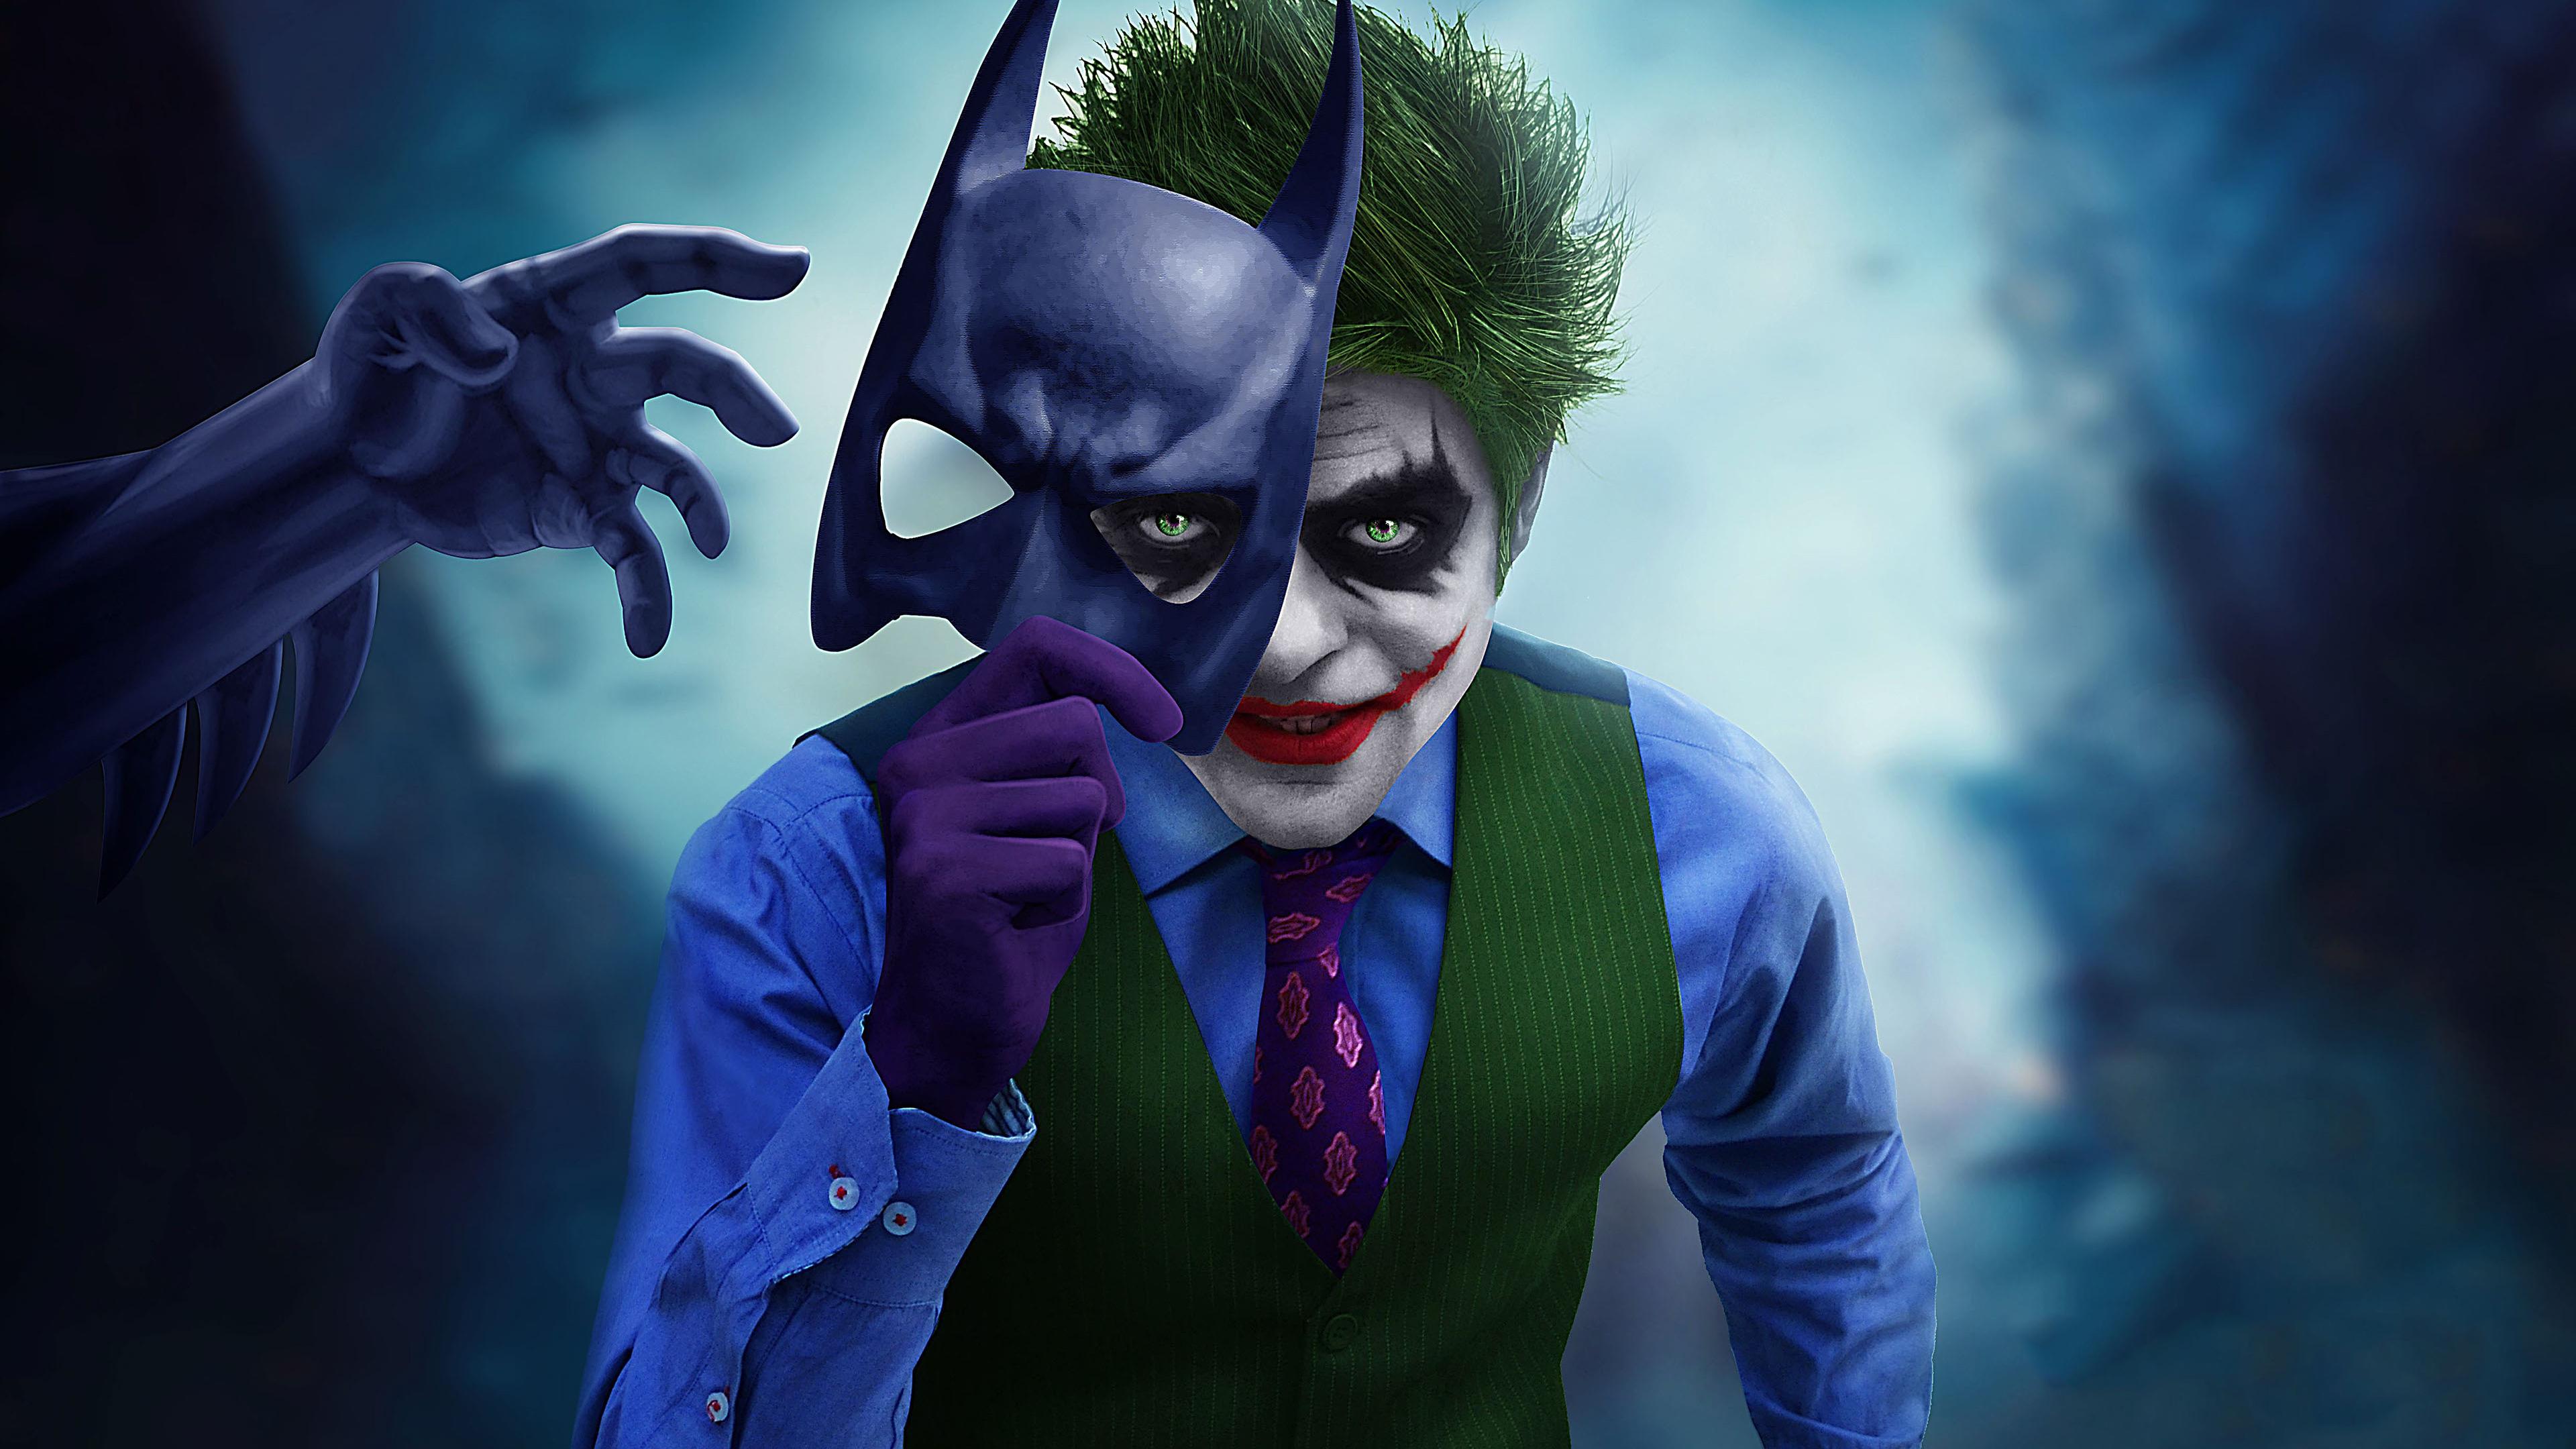 Wallpaper 4k Joker With Batman Mask Off 4k Wallpapers